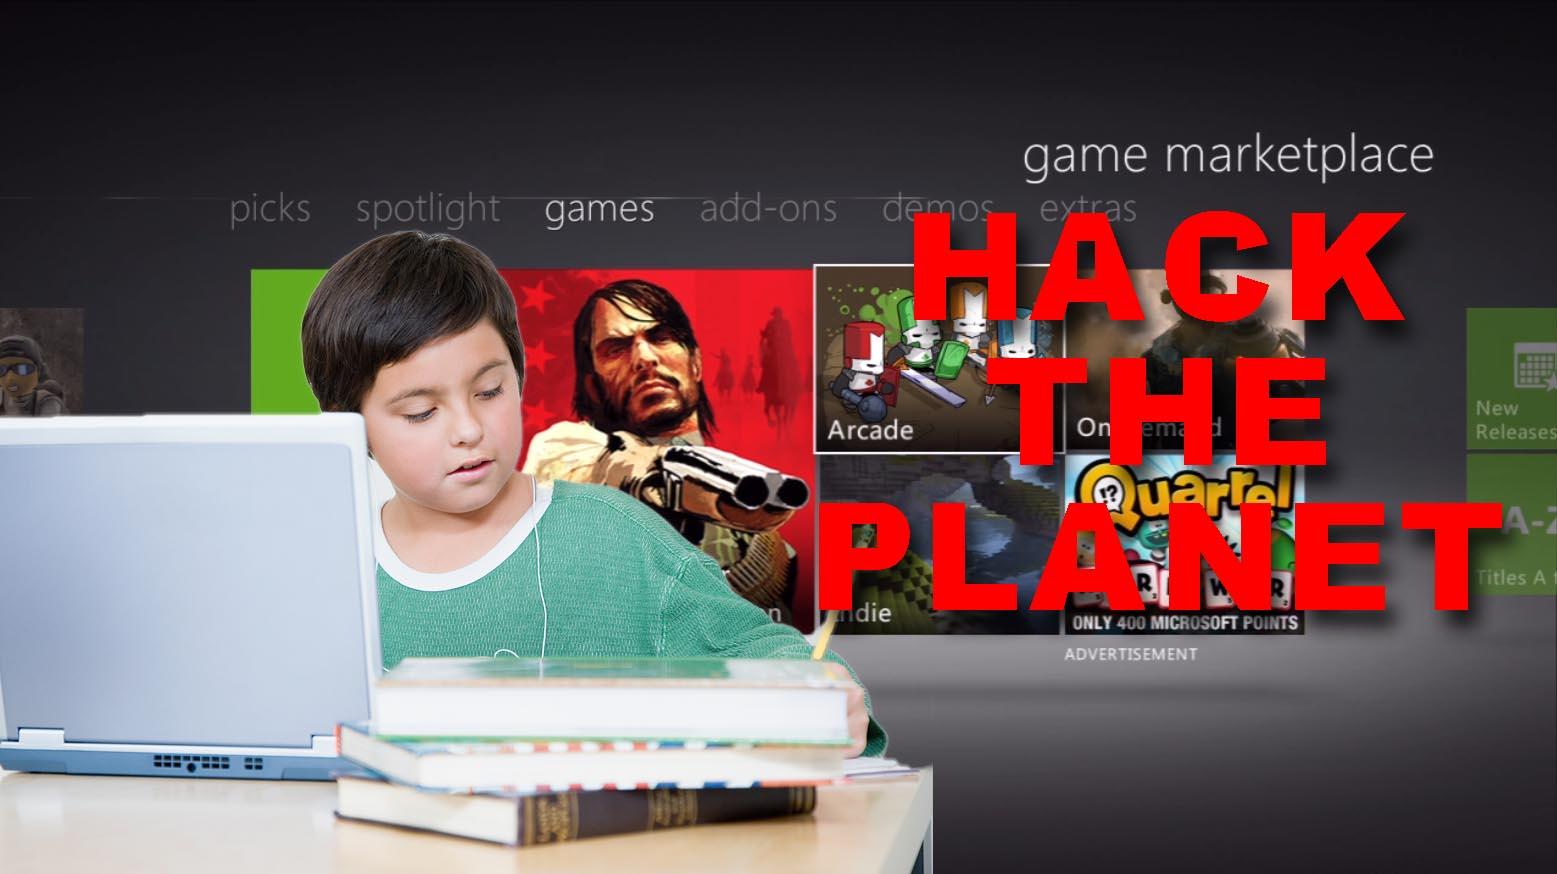 5 year old Xbox hacker